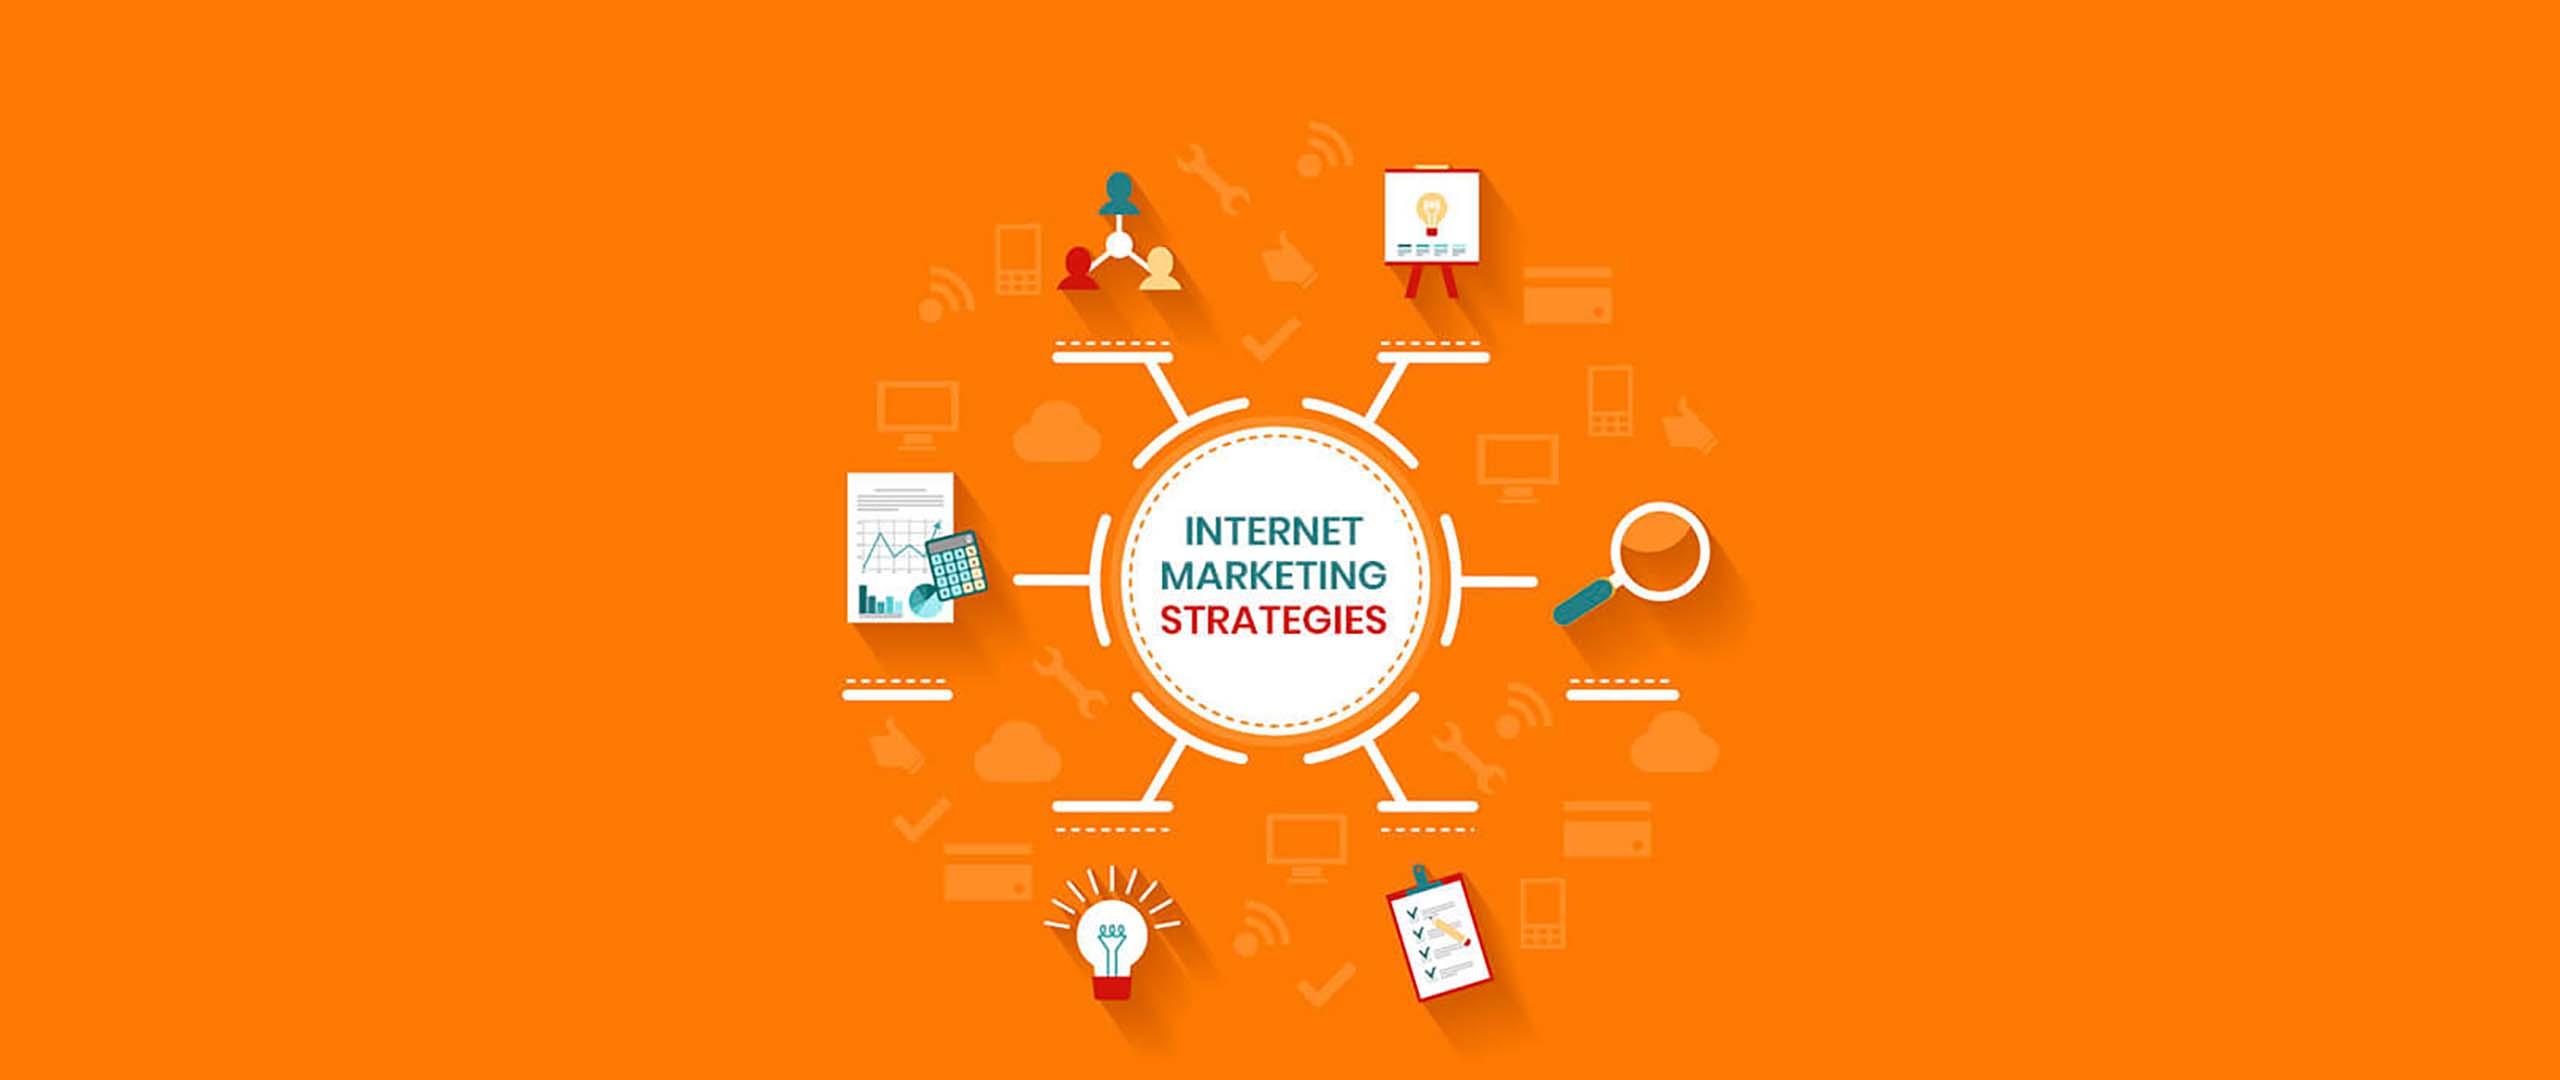 7 Different Internet Marketing Strategies